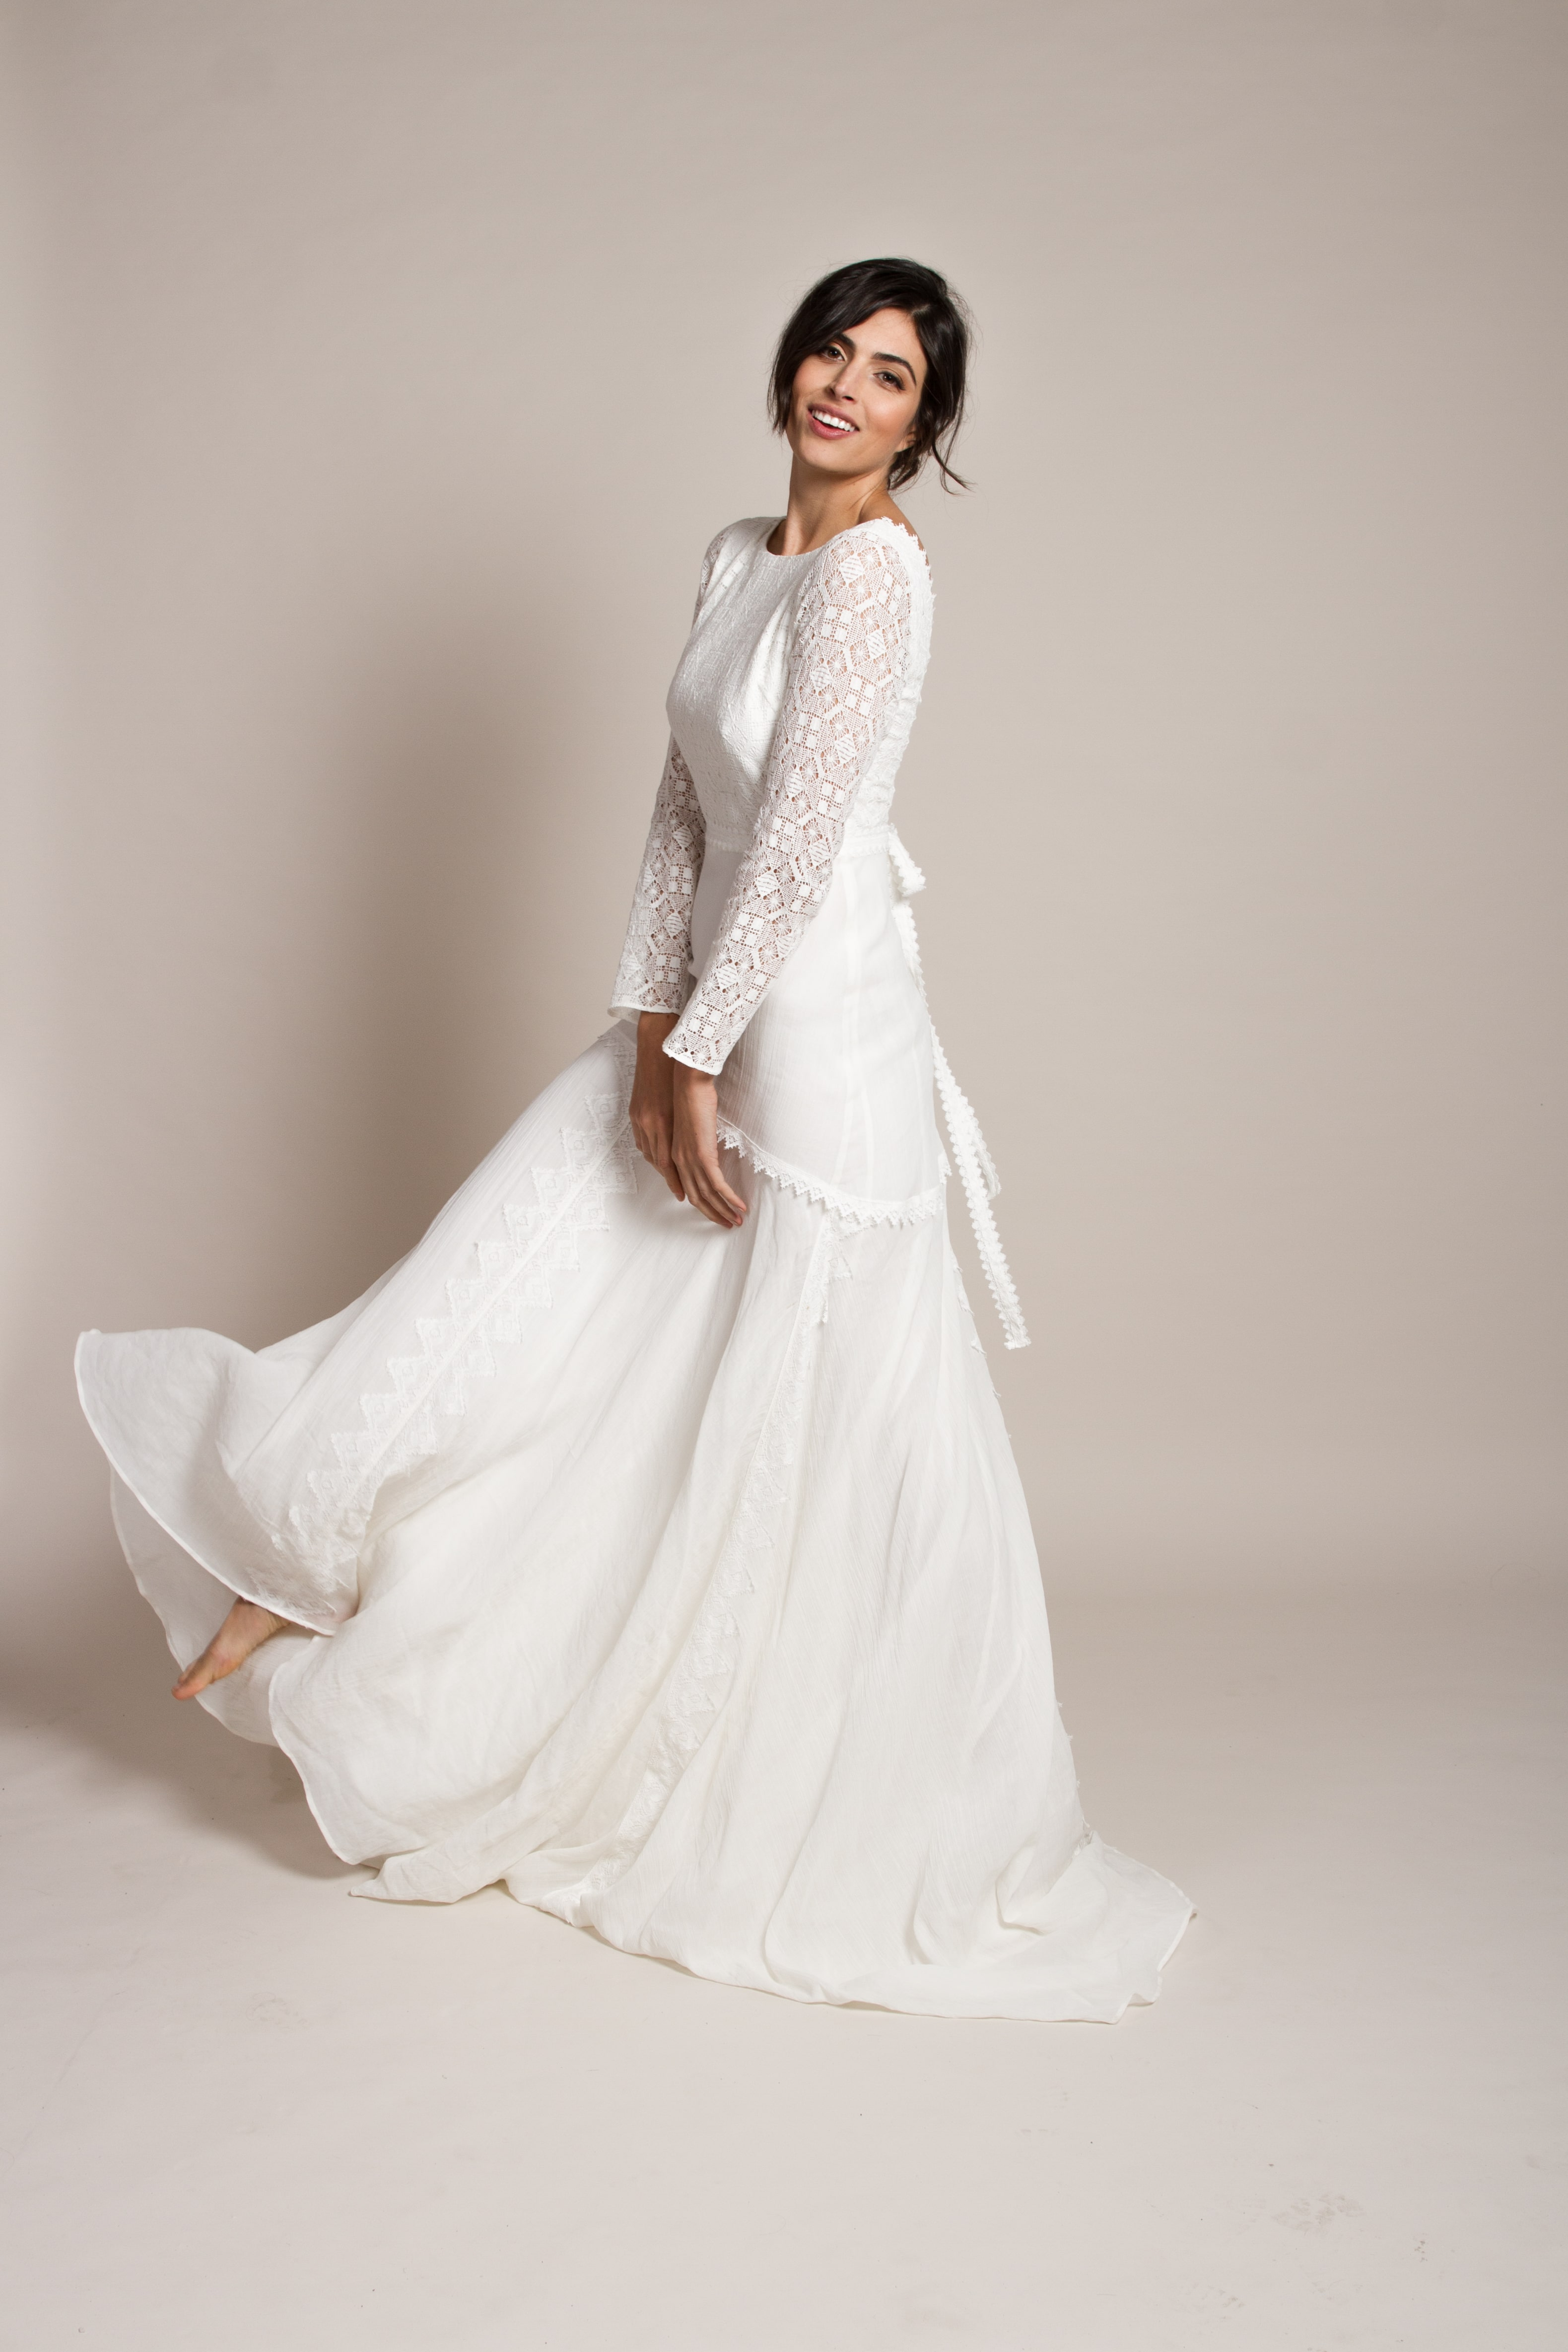 boho-bridal-image-women-in-wedding-dress